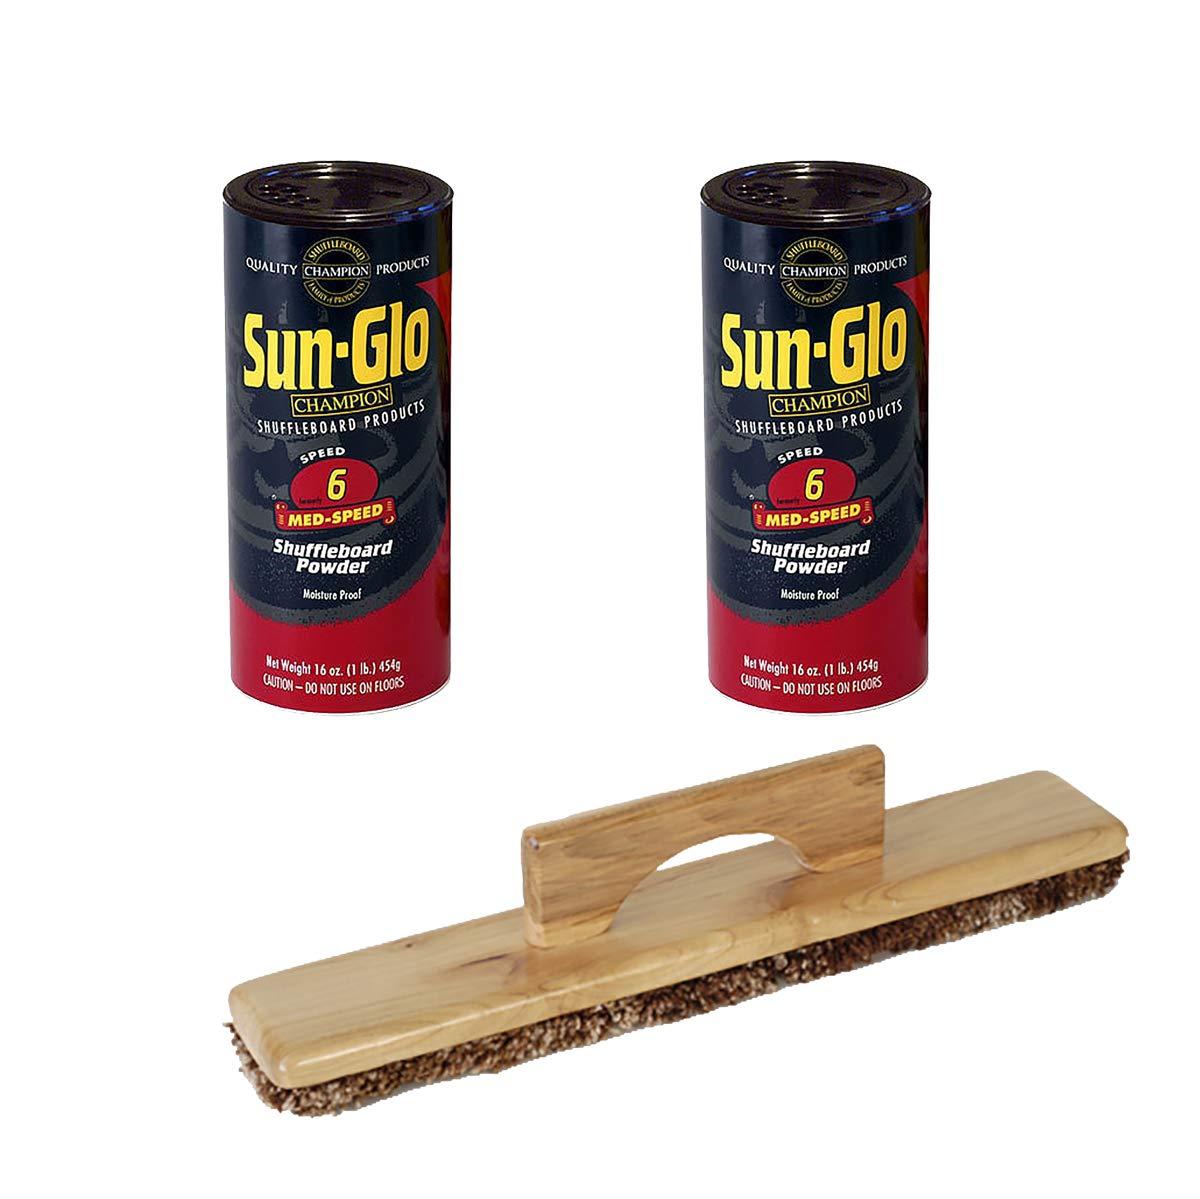 Twin Pack of Sun-Glo Speed #6 Medium Speed Shuffleboard Table Powder Wax (2 Pack) Bundled with a Sun-Glo Shuffleboard Sweep by Sun-Glo